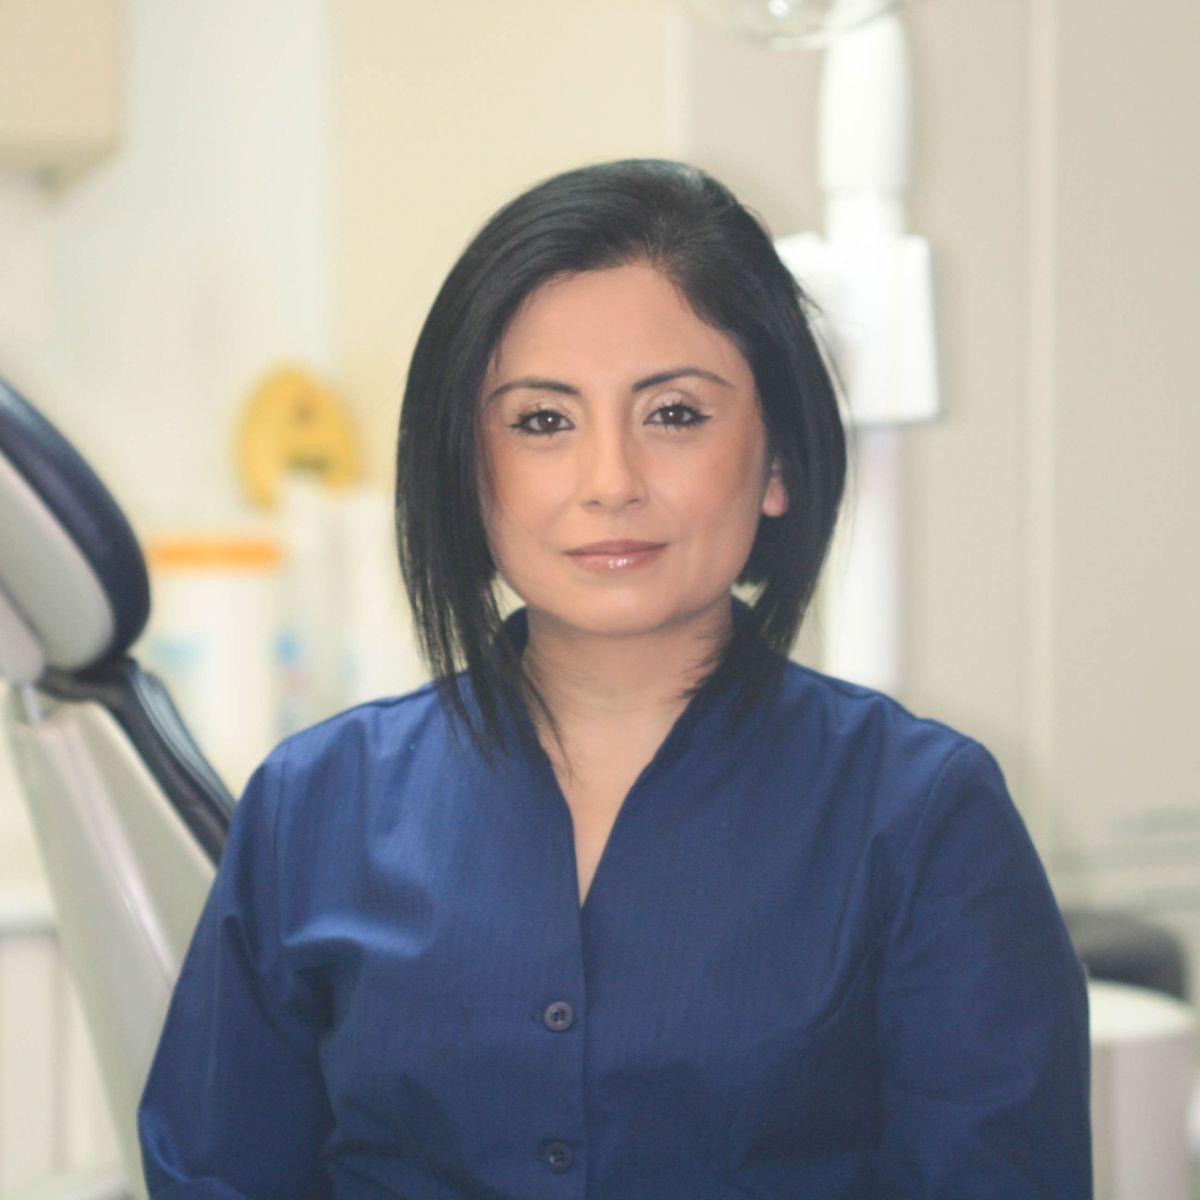 Ms Pamela Quiroga Bridy